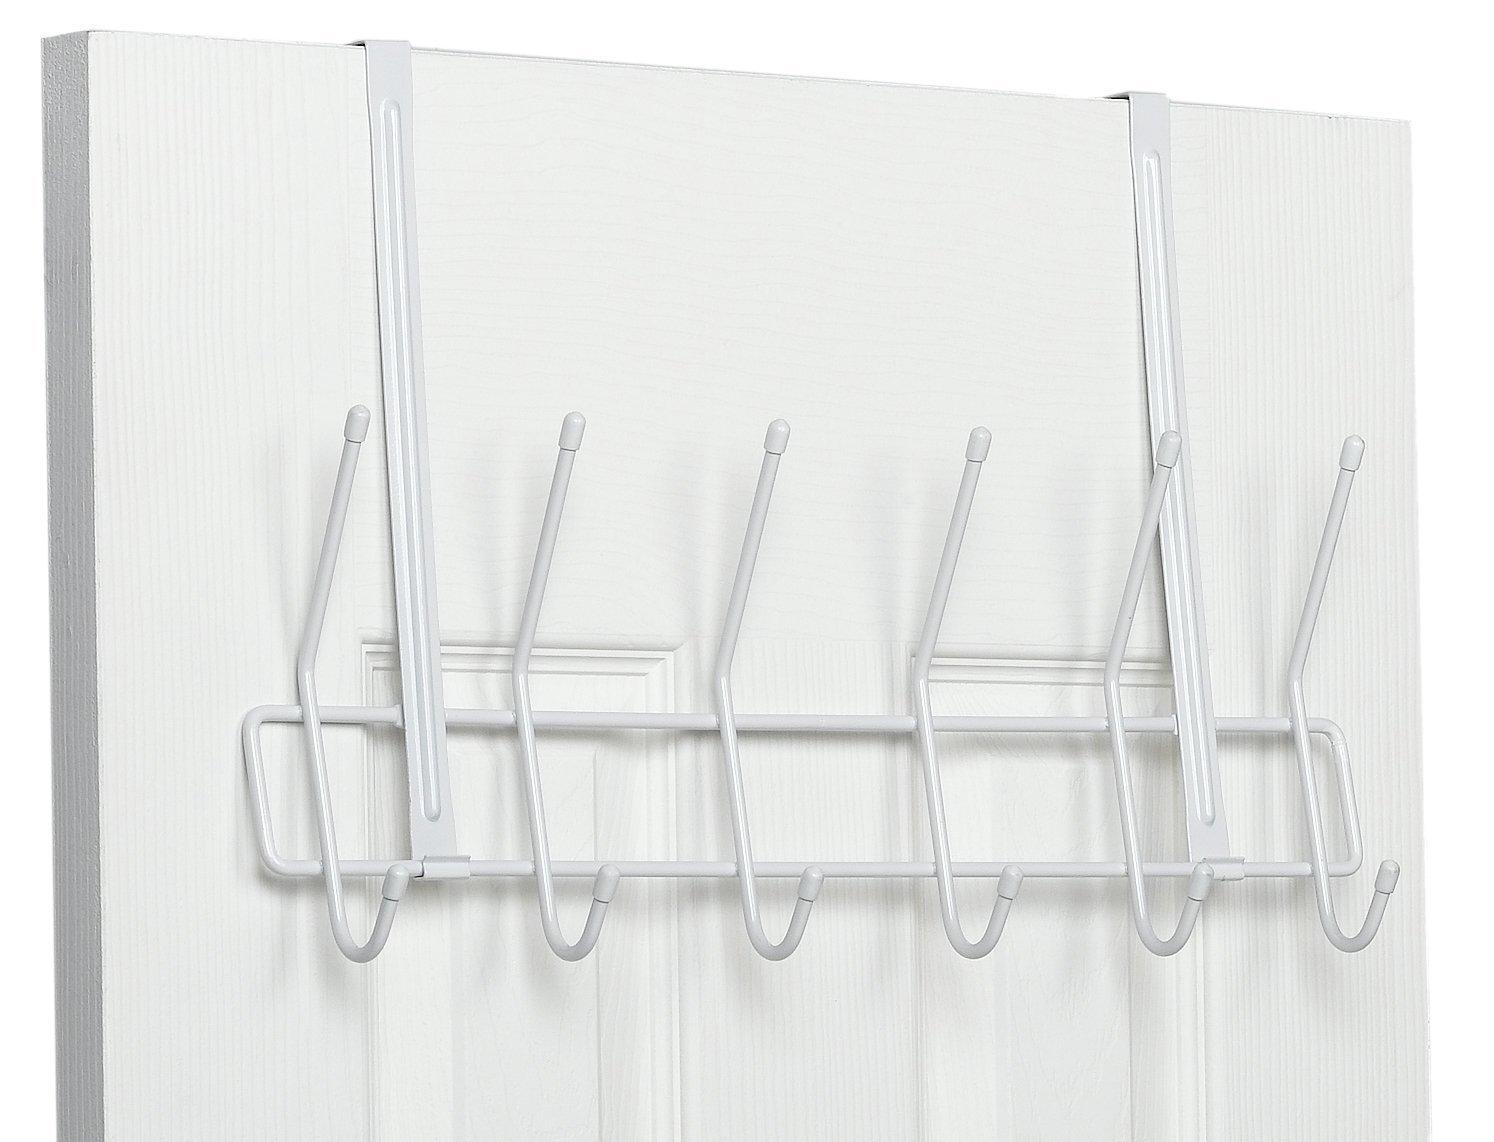 Amazon.com: ClosetMaid 1220 Over The Door Utility Hook, White: Home U0026  Kitchen